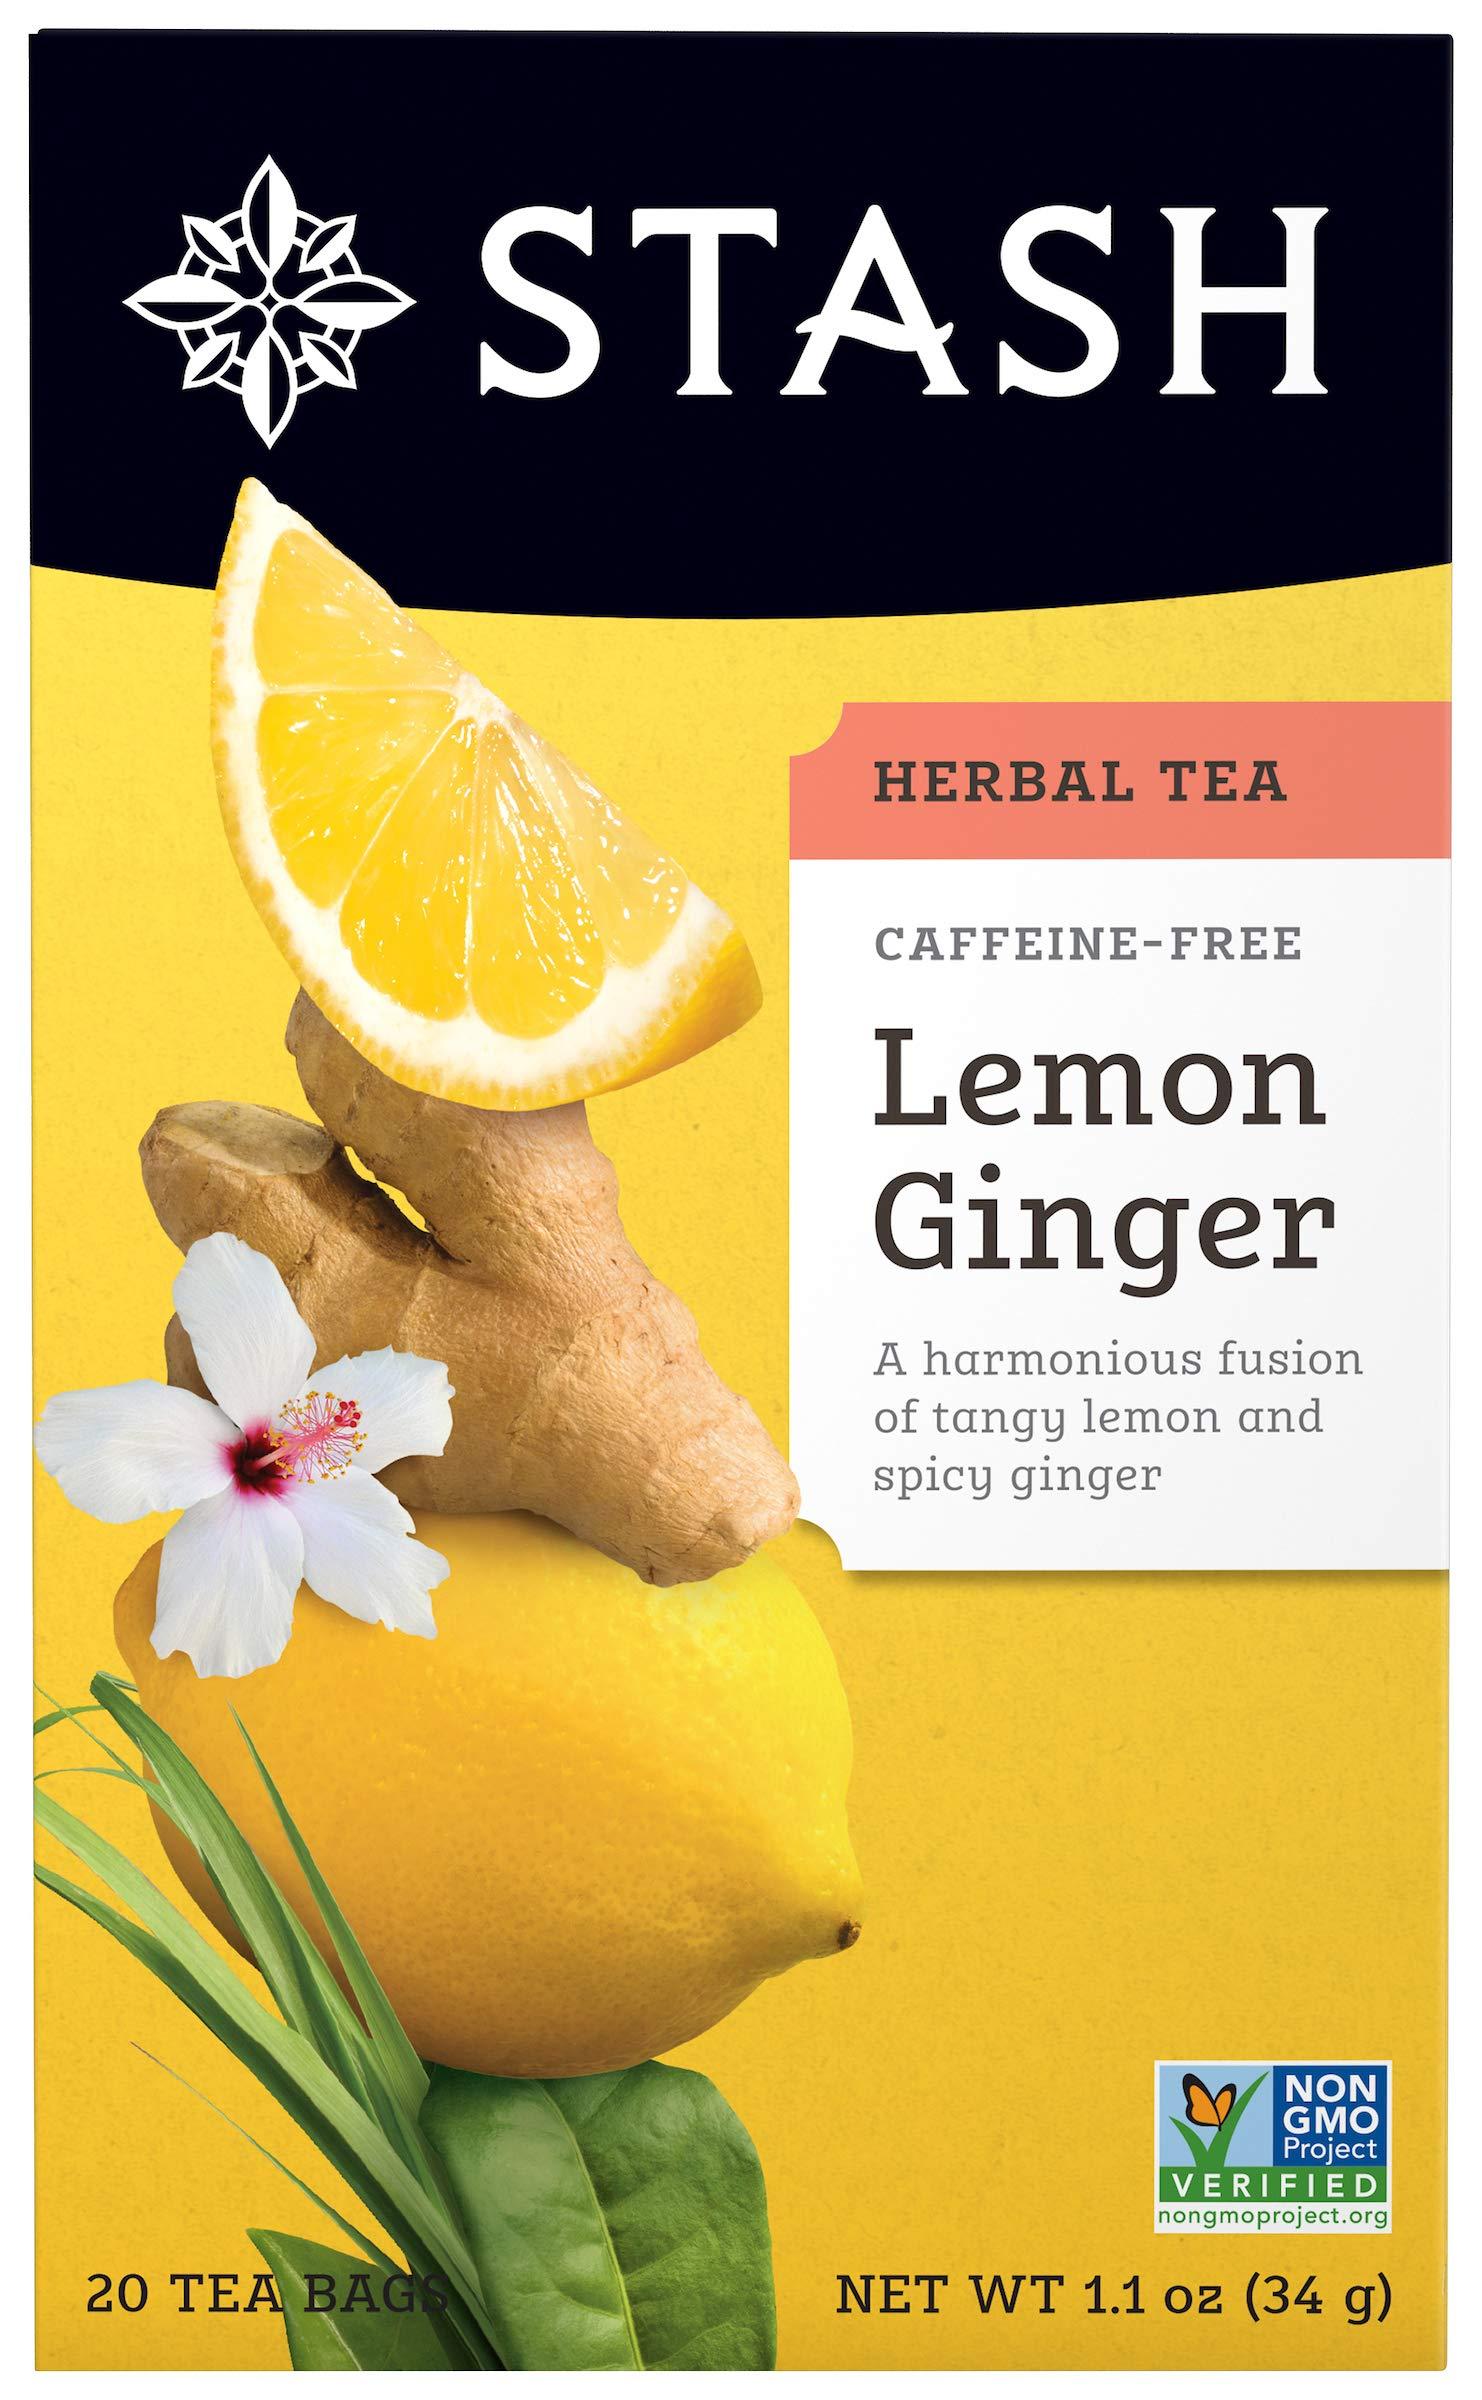 Stash Tea Lemon Ginger Herbal Tea, 20 Tea Bags Per Box, Premium Herbal Tisane, Citrus-y Warming Herbal Tea, Enjoy Hot or Iced